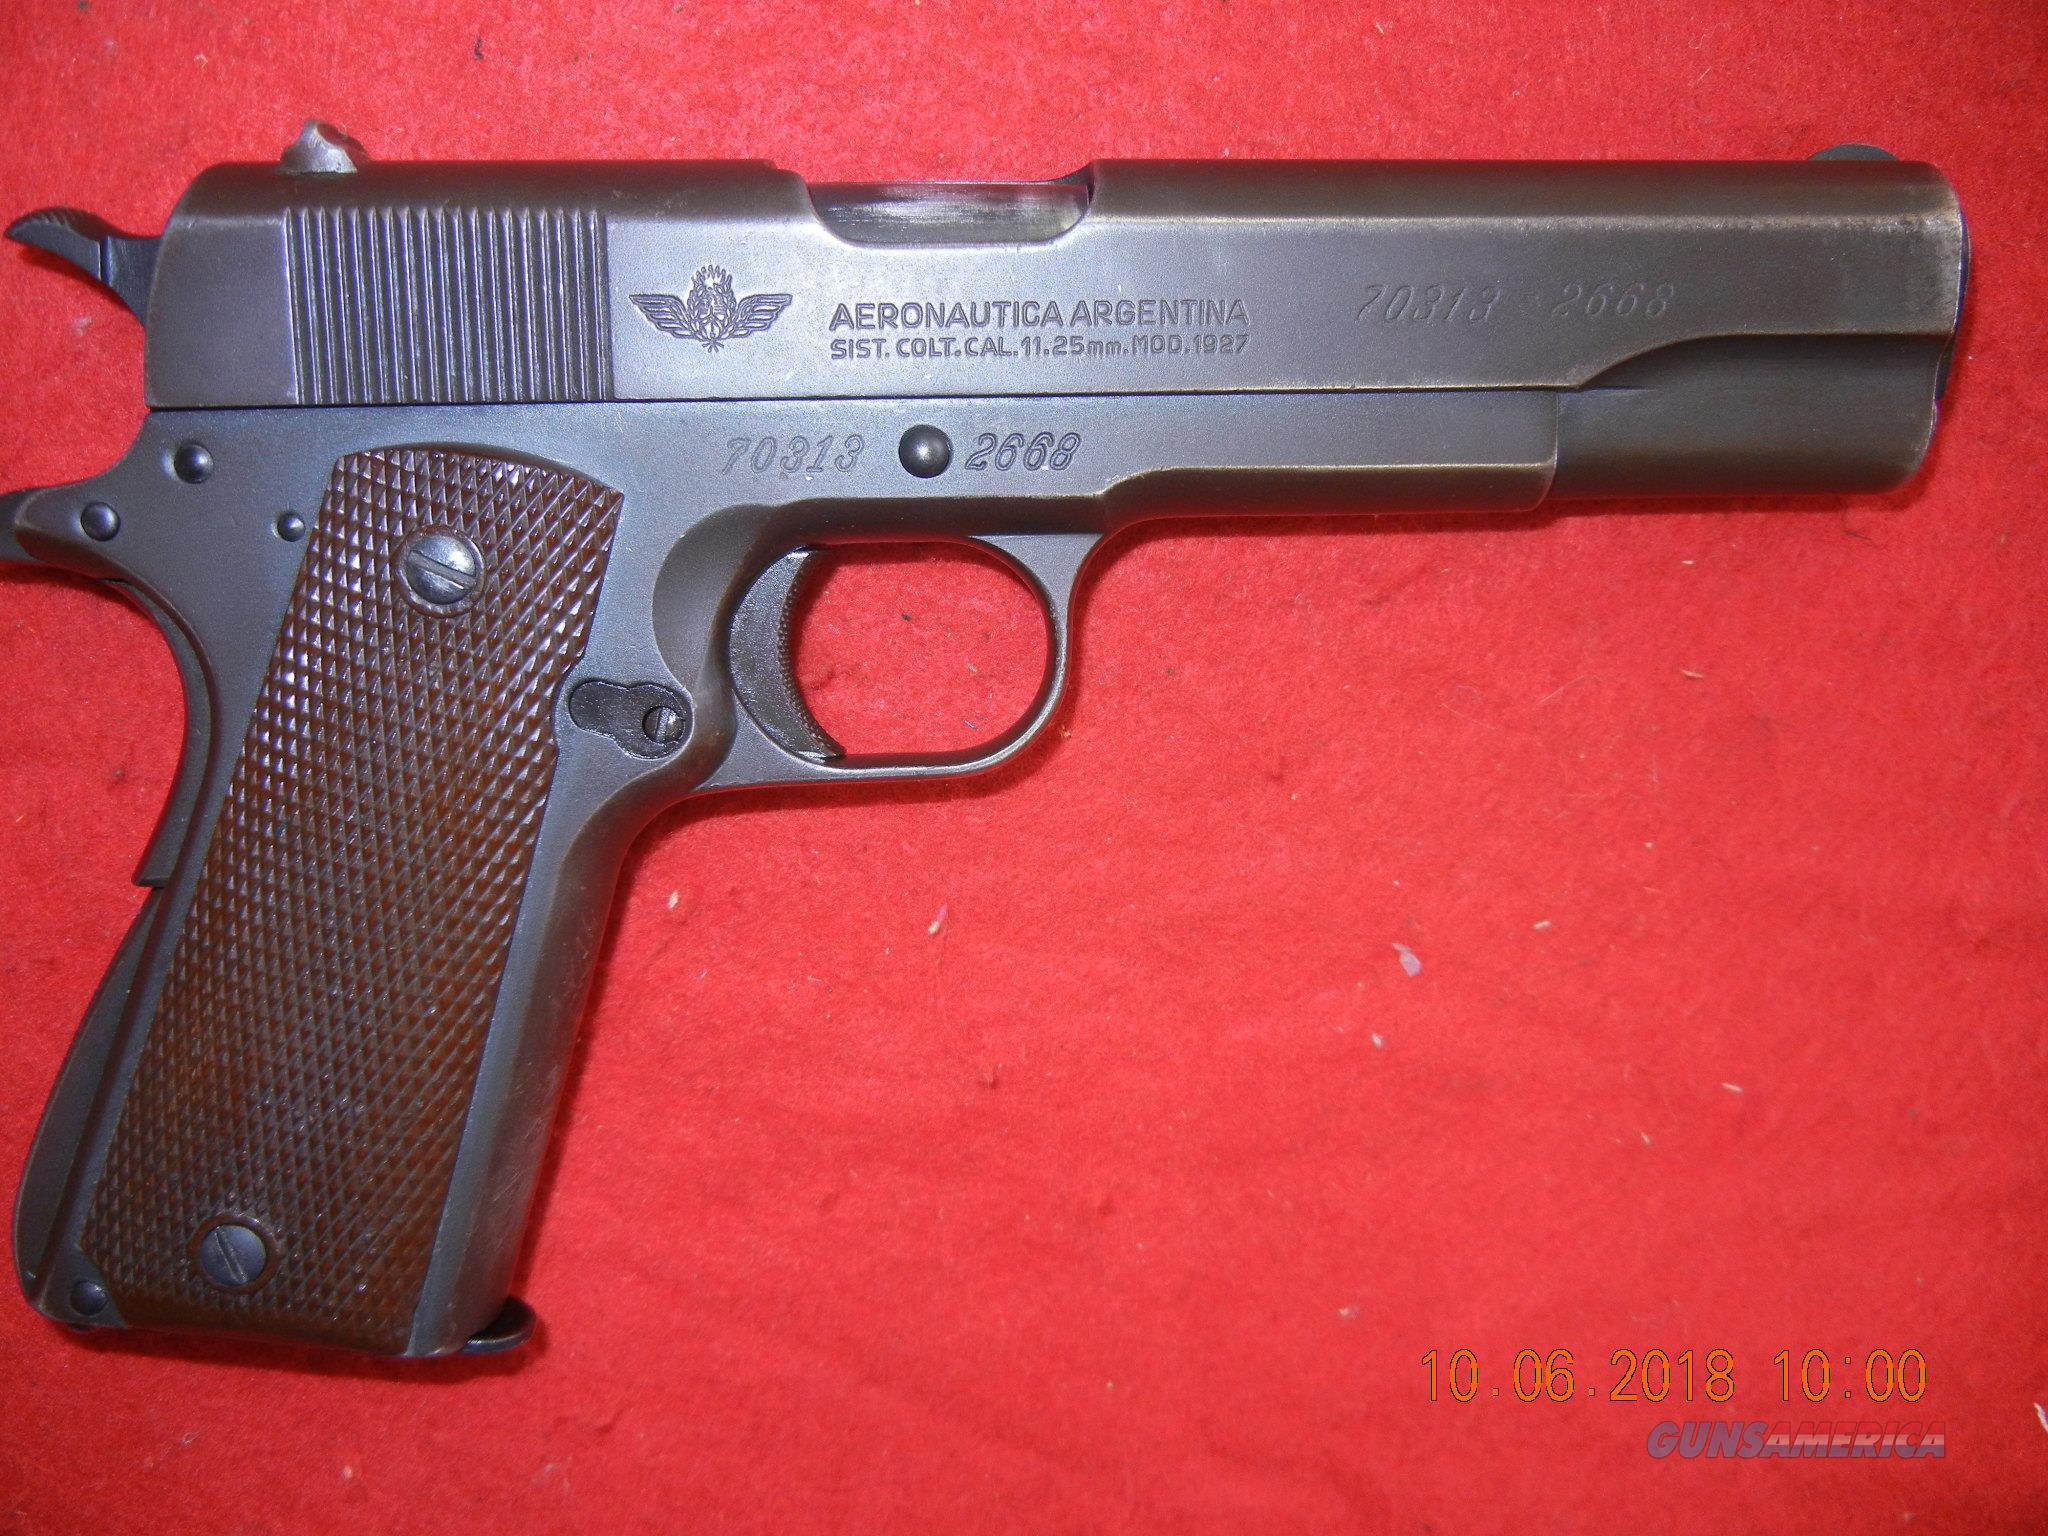 COLT AERONAUTICA ARGENTINA MOD 1927  Guns > Pistols > Colt Automatic Pistols (1911 & Var)